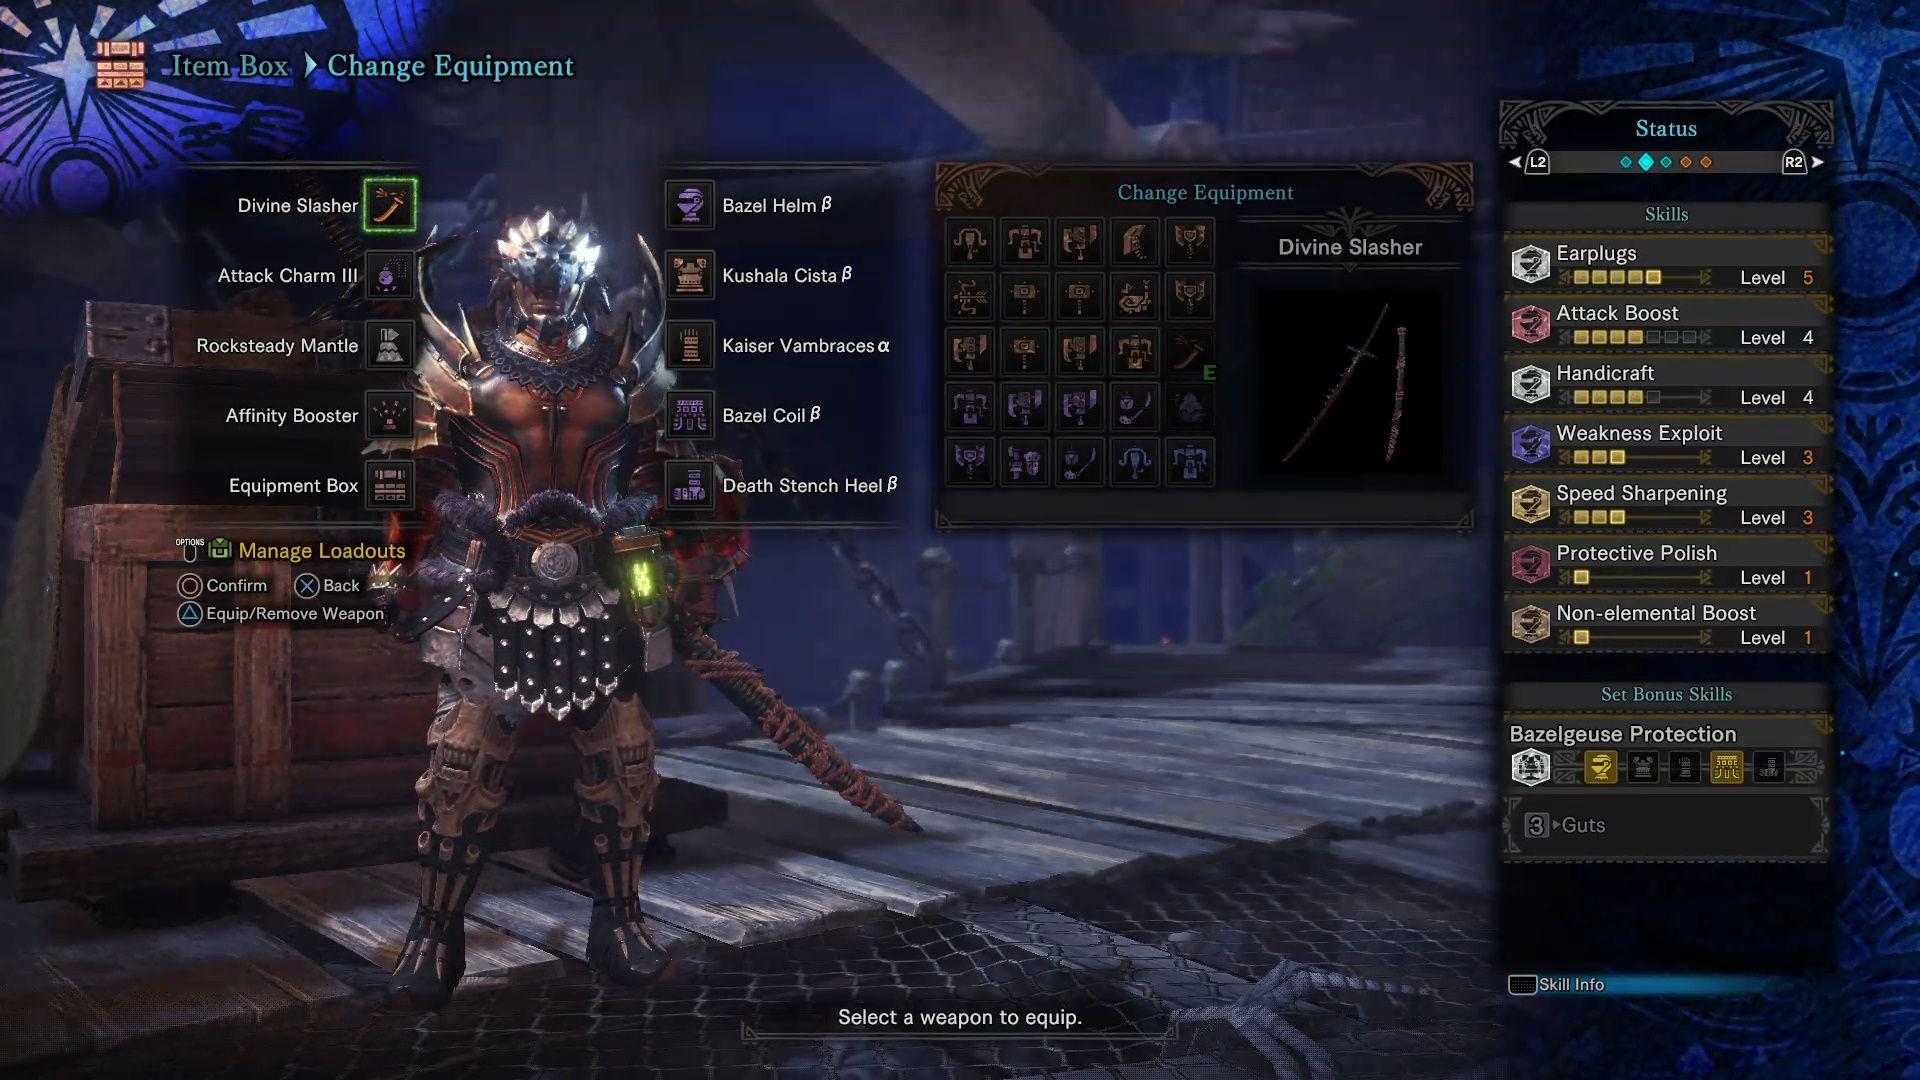 MHW Long Sword - Non-elemental Longsword setting with Divine